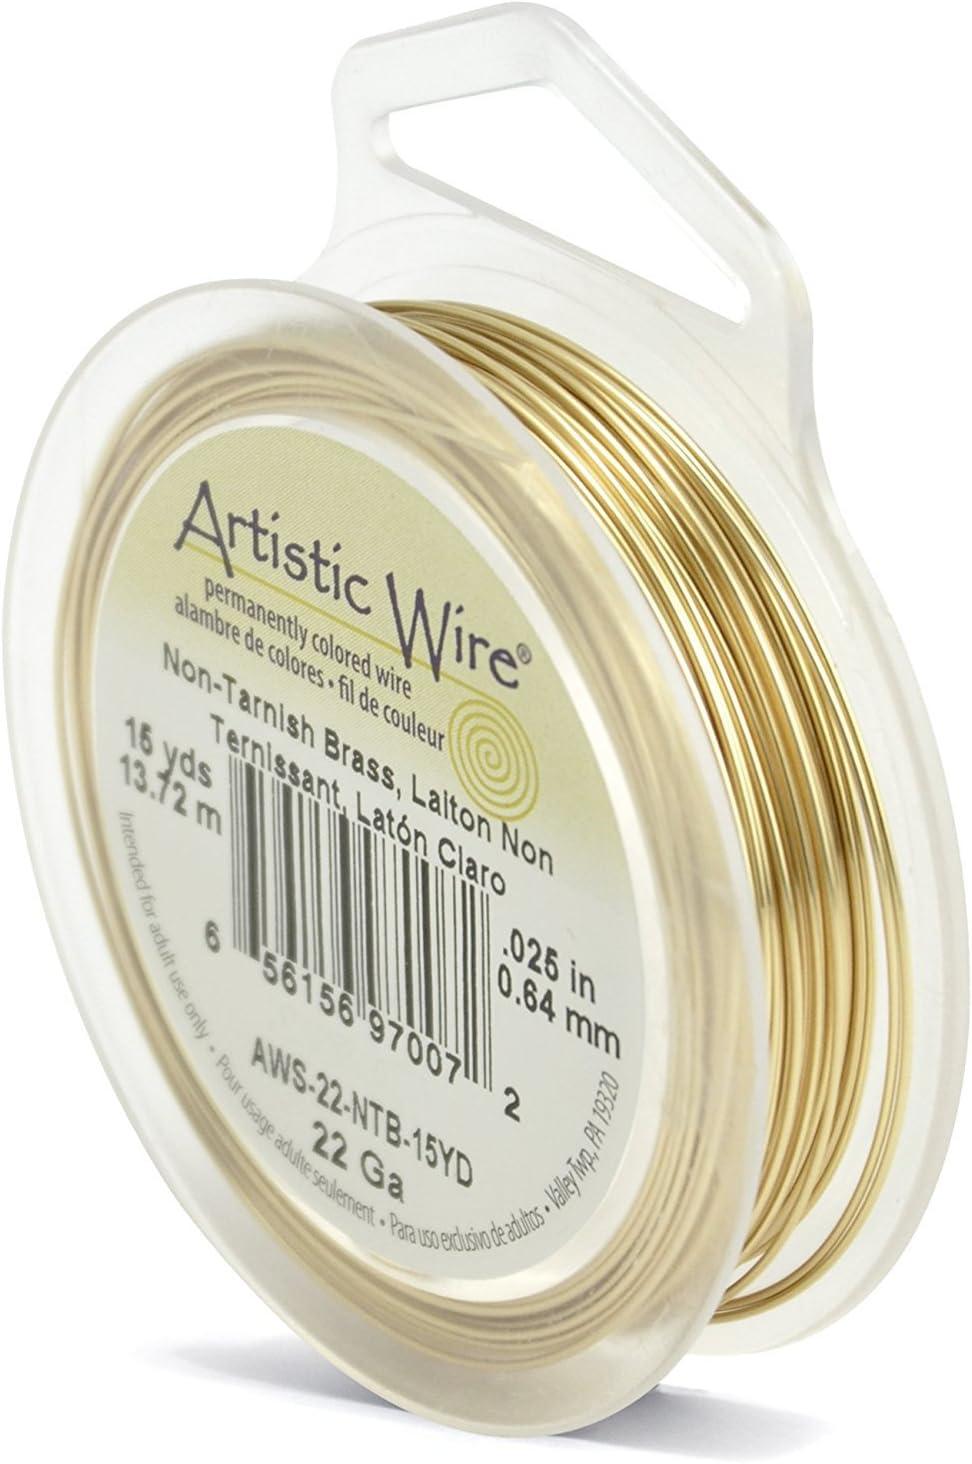 Artistic Wire\u00ae Buy-The-Dozen\u2122 22 Gauge Variety Pack Jewelry Coil Making Wire BDC-860.22